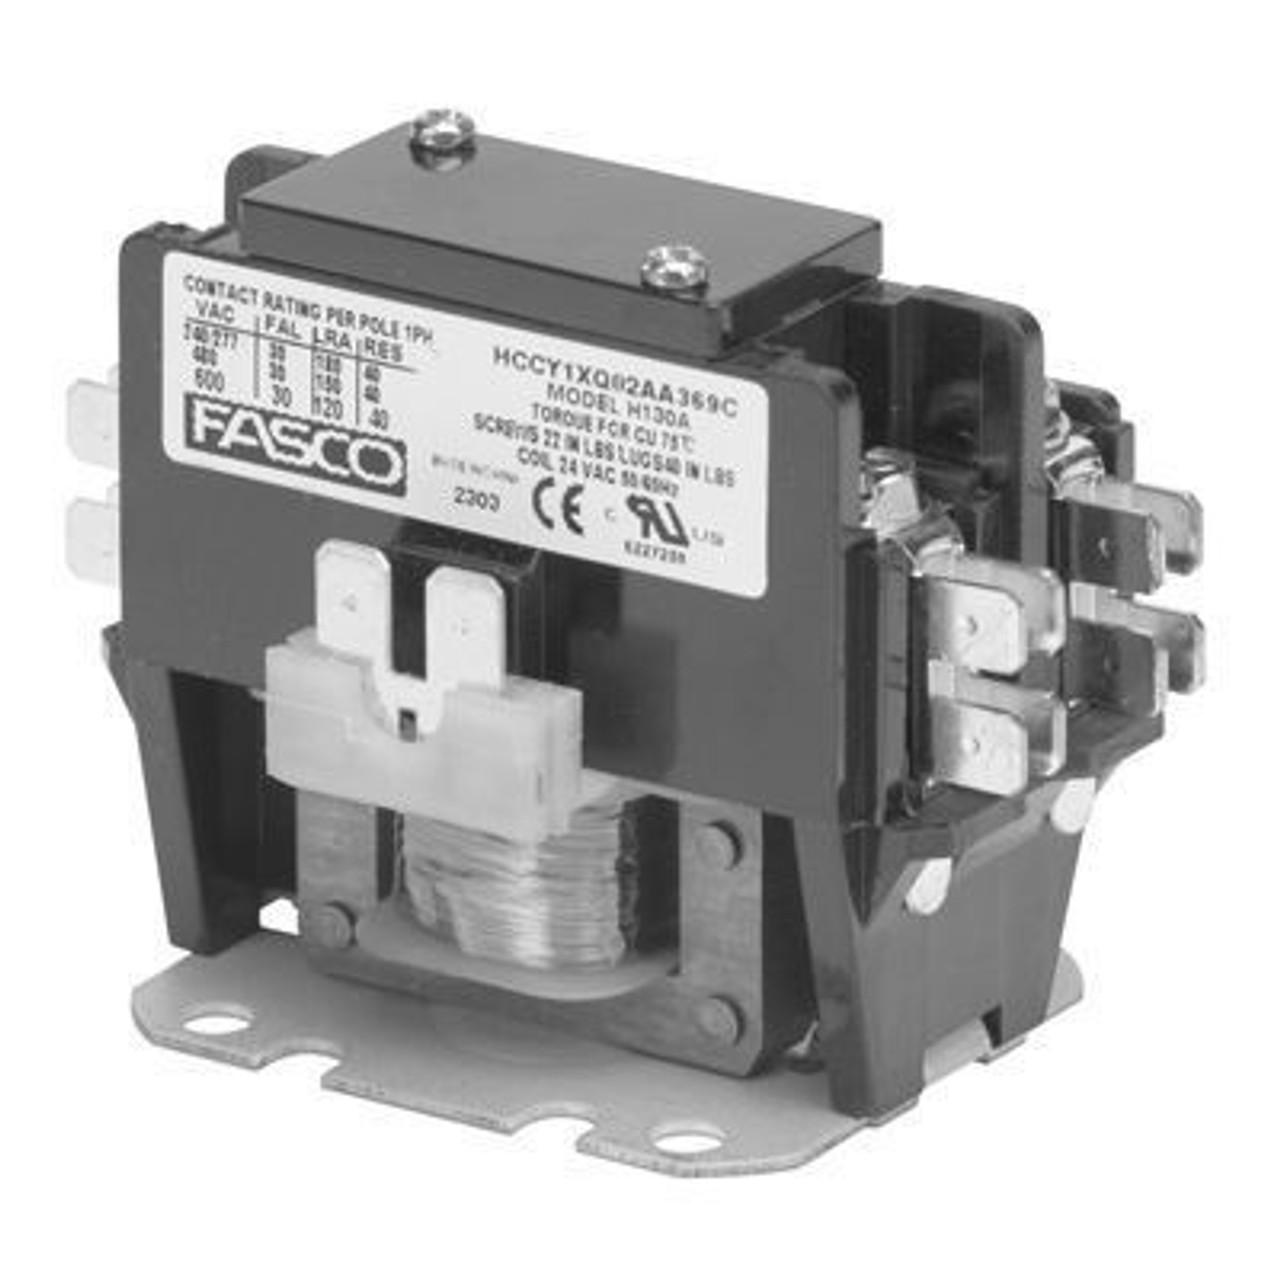 H130B, 1 pole, 30 amp, 120v coil Fasco Contactor